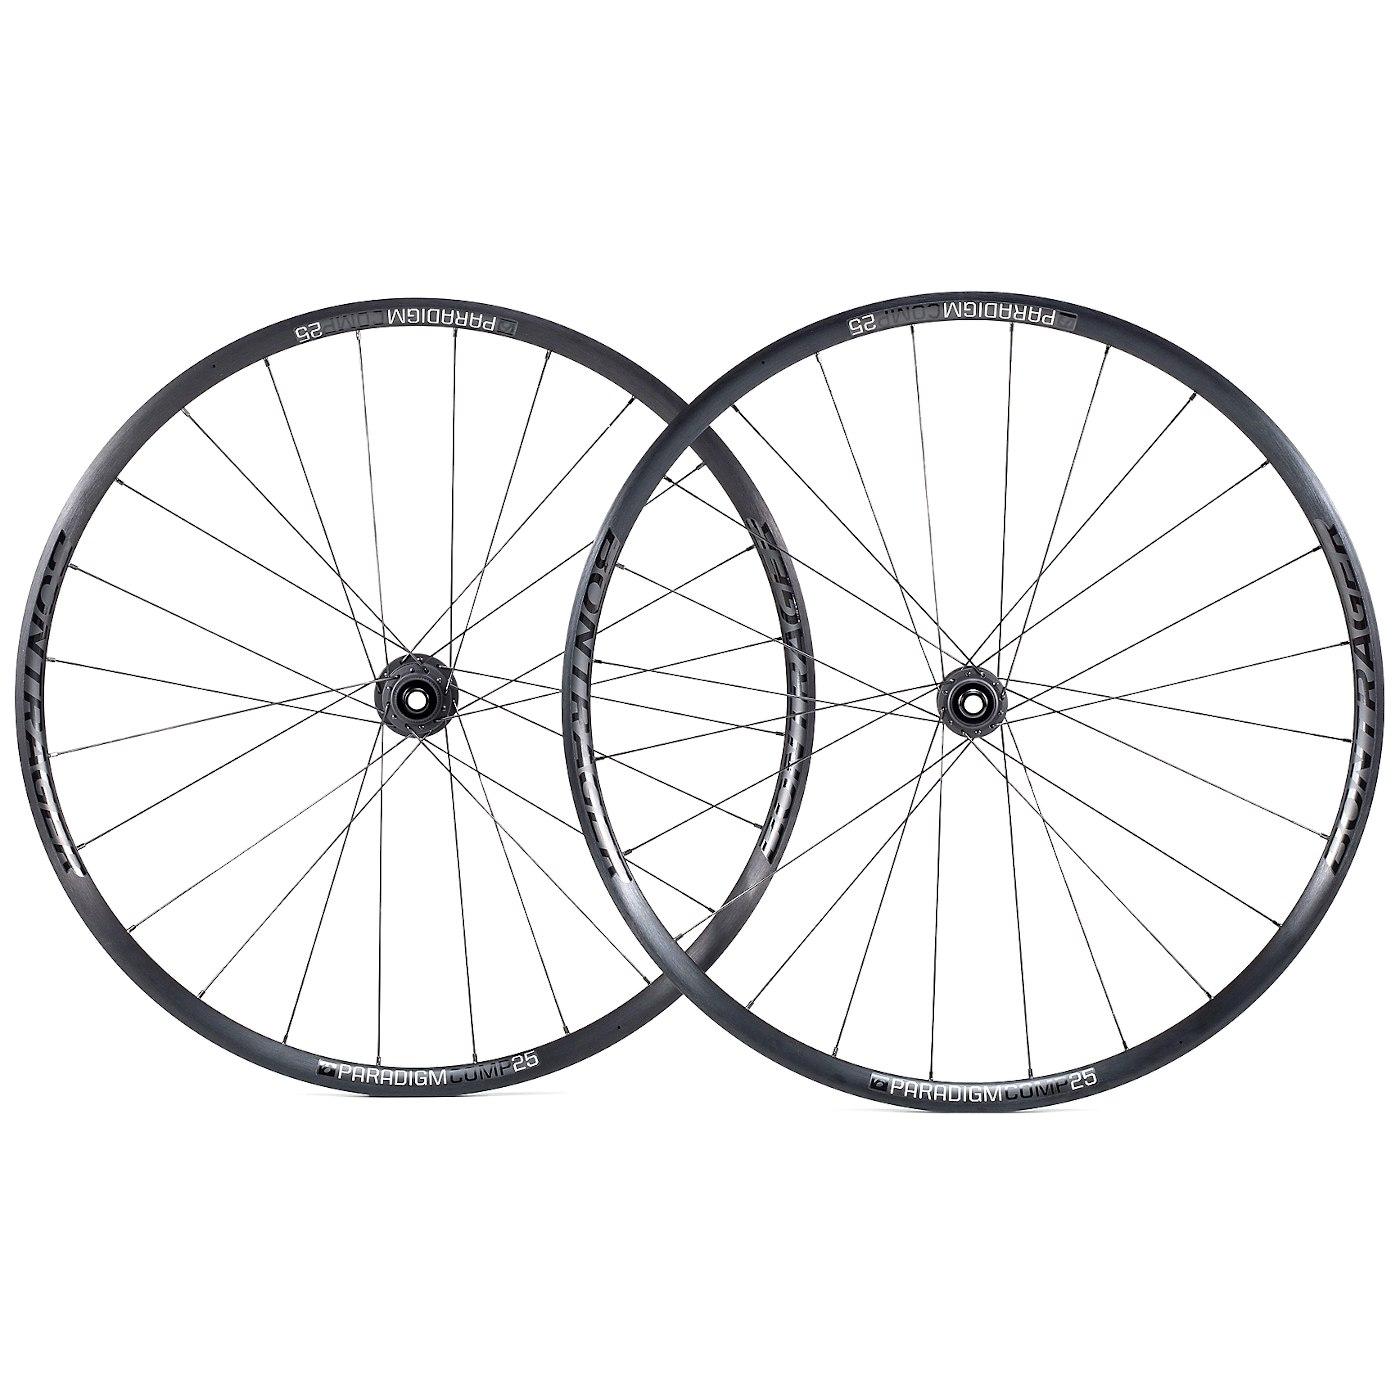 Bontrager Paradigm Comp 25 TLR Disc Road Wheelset - Clincher - Centerlock - FW: 12x100mm | RW: 12x142mm